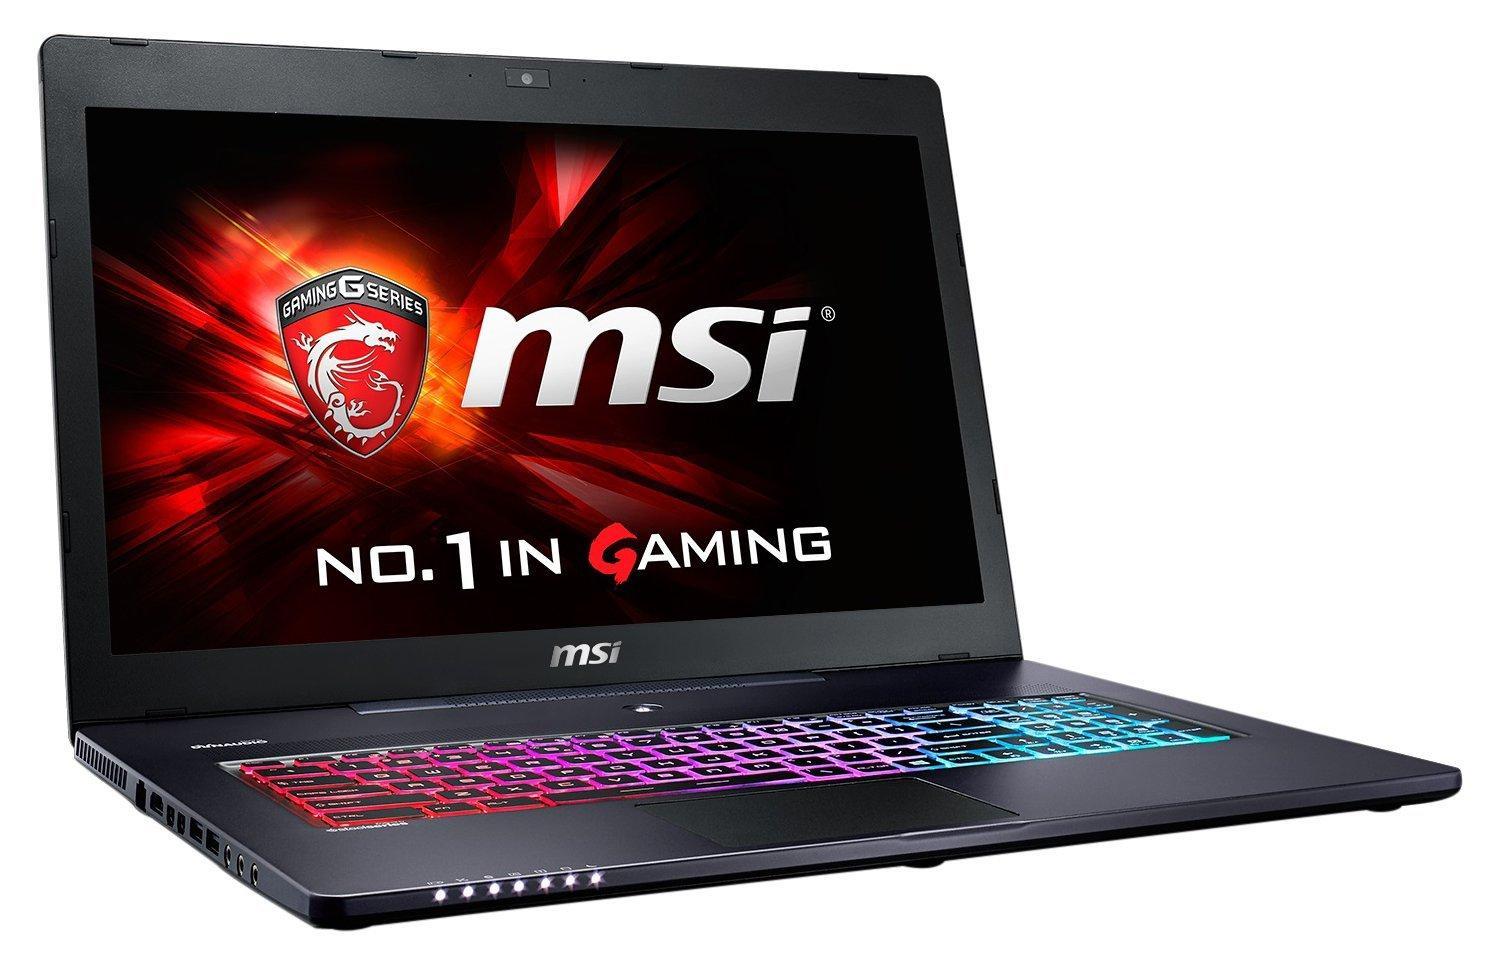 "PC Portable Gamer 17.3"" MSI GS70 6QE-276FR Gris - Full HD, i7-6700HQ 3.5 Ghz, RAM 16 Go, HDD 1 To + SSD 256 Go, GeForce GTX970M, Windows 10"